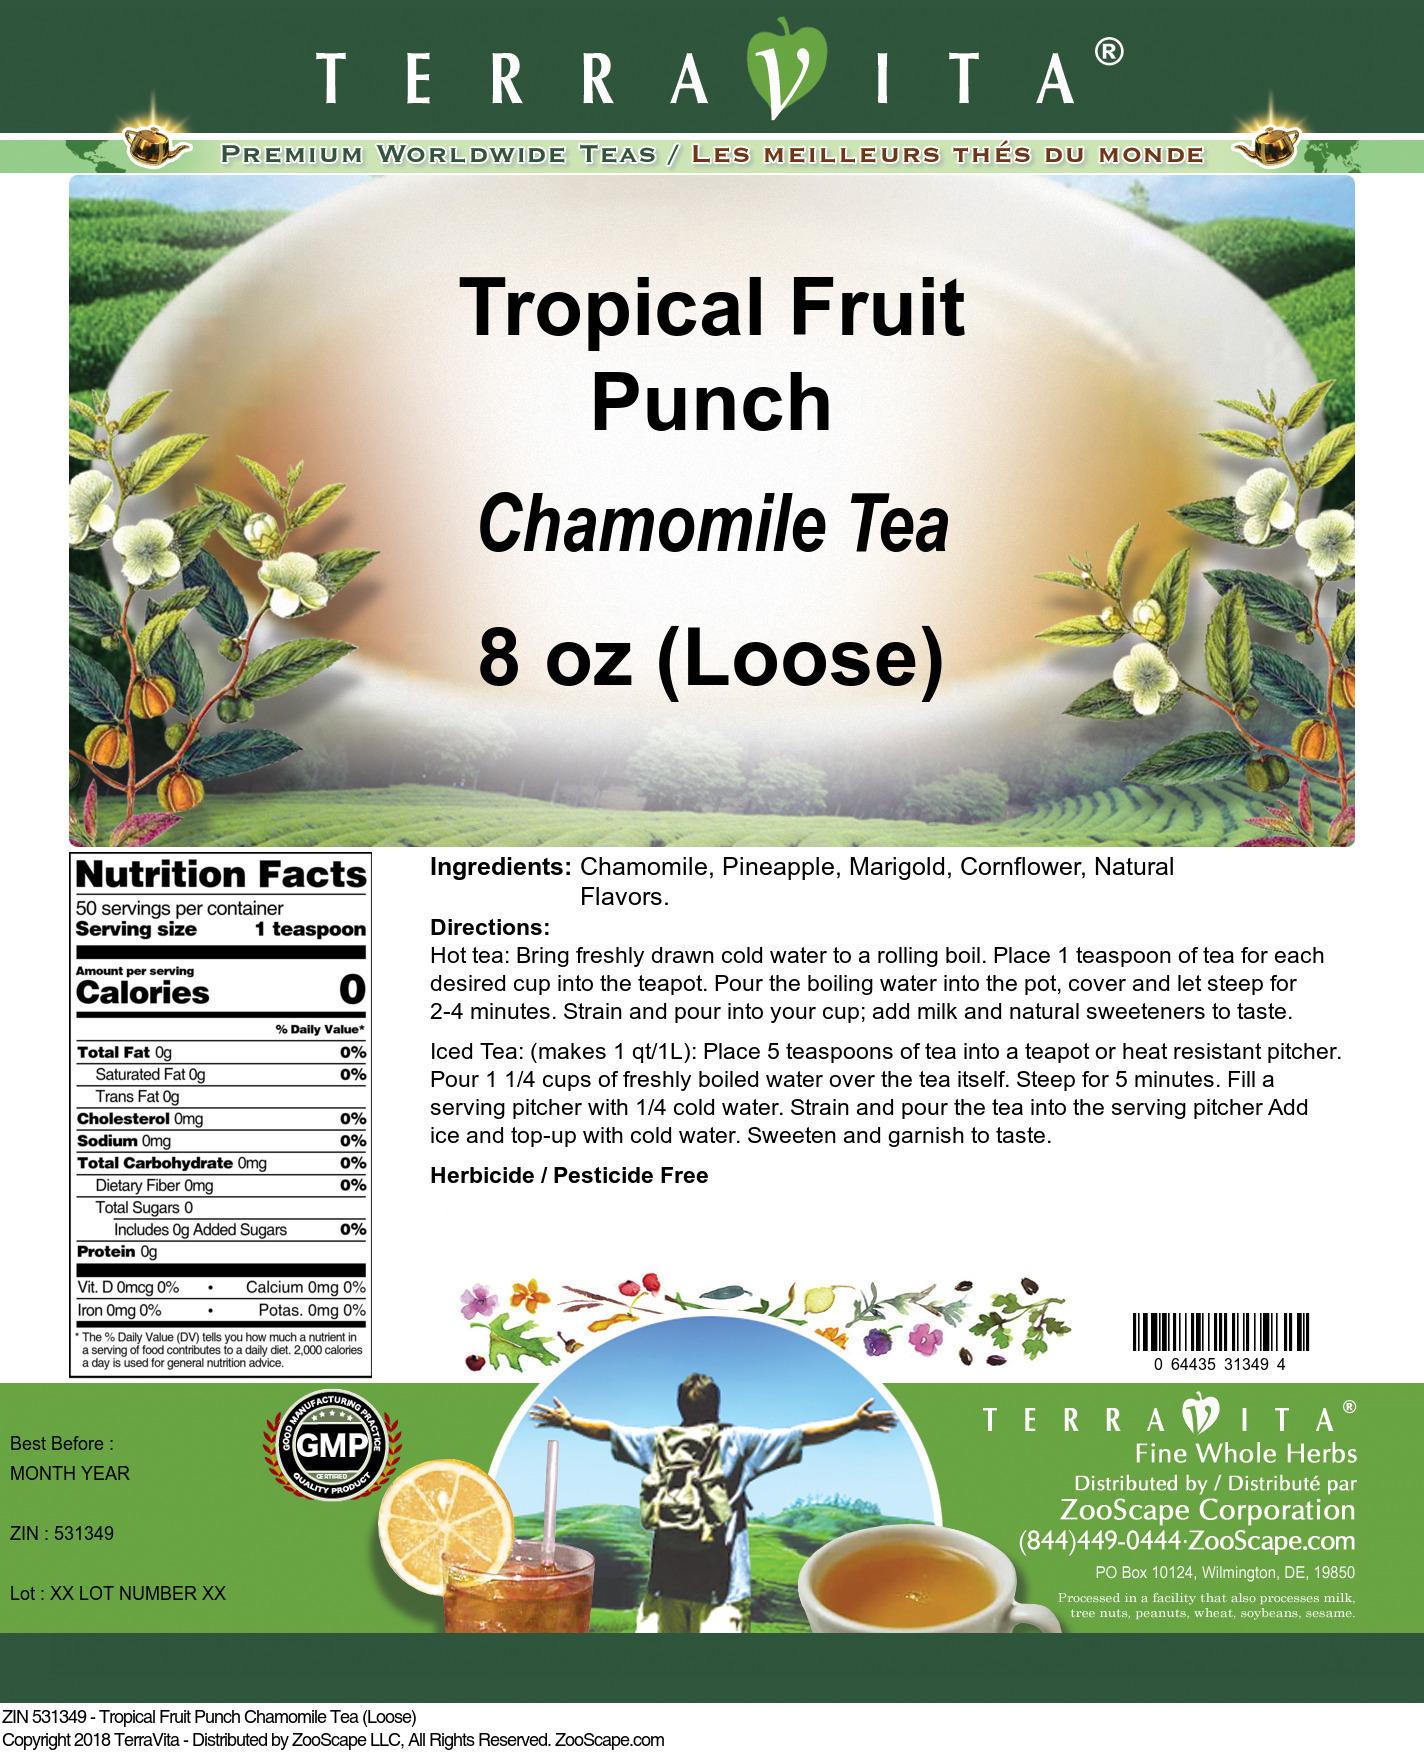 Tropical Fruit Punch Chamomile Tea (Loose)